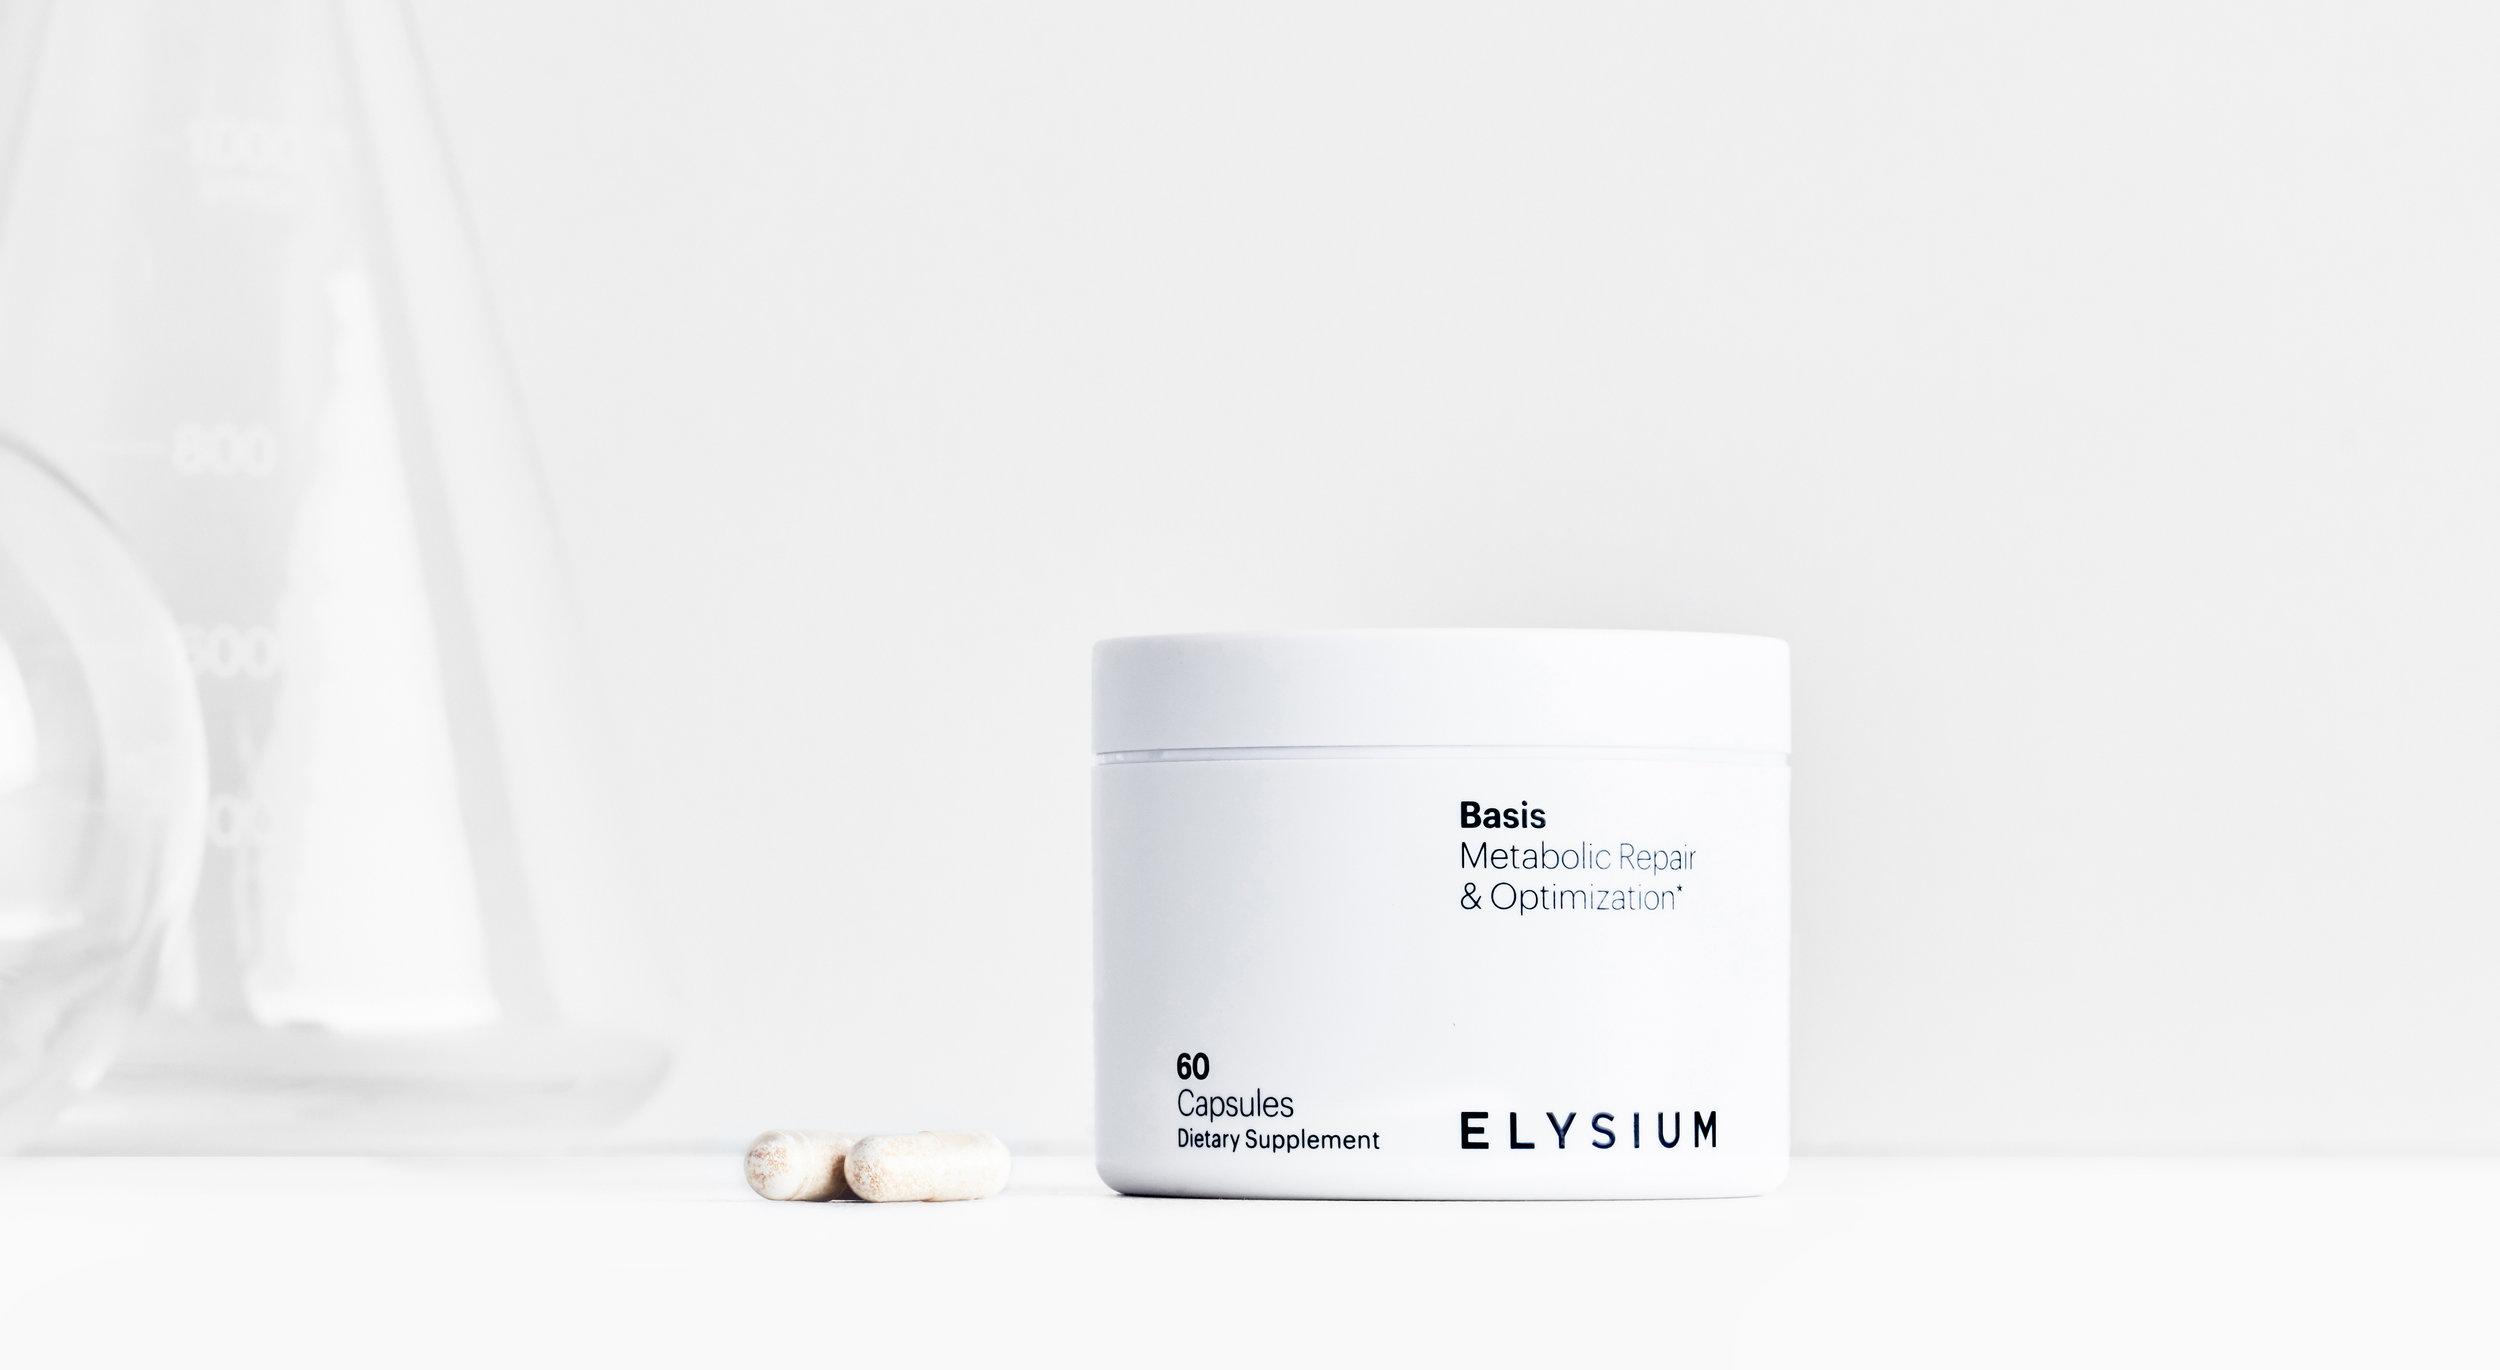 Elysium_Product_Basis.jpg